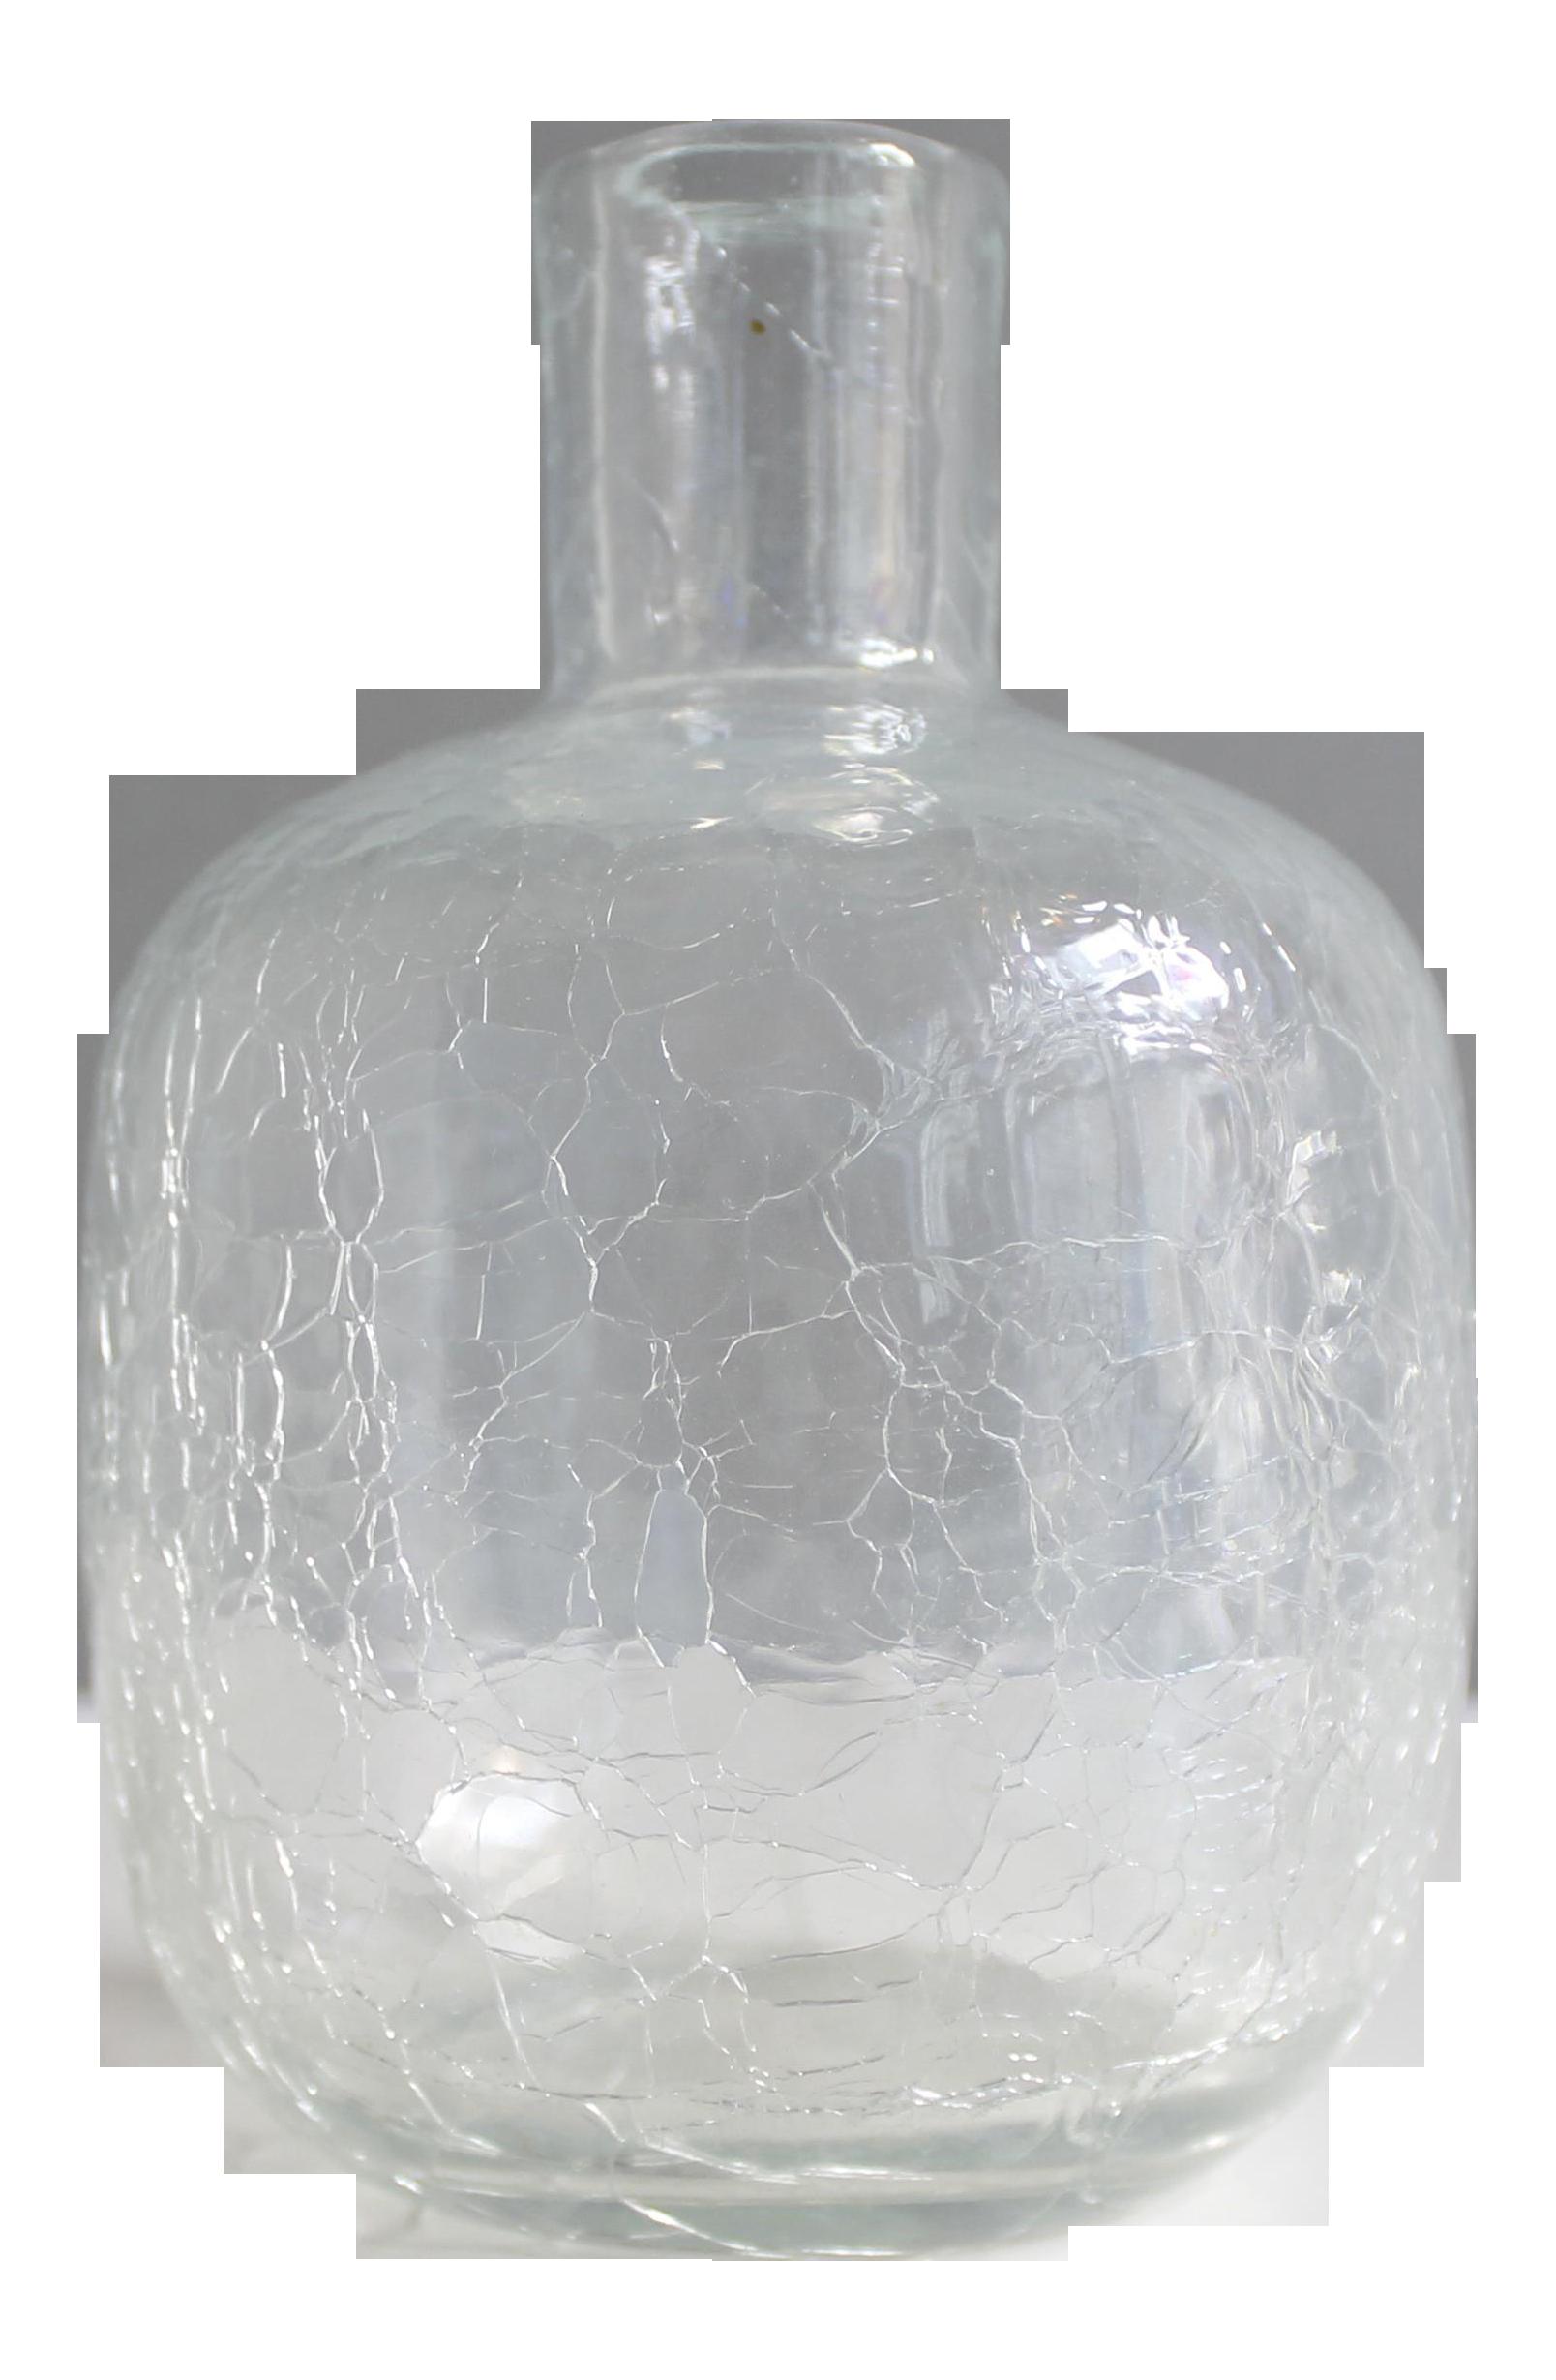 Vintage blenko crackle glass vase joel myers 6462 mid century vintage blenko crackle glass vase joel myers 6462 mid century modern chairish reviewsmspy